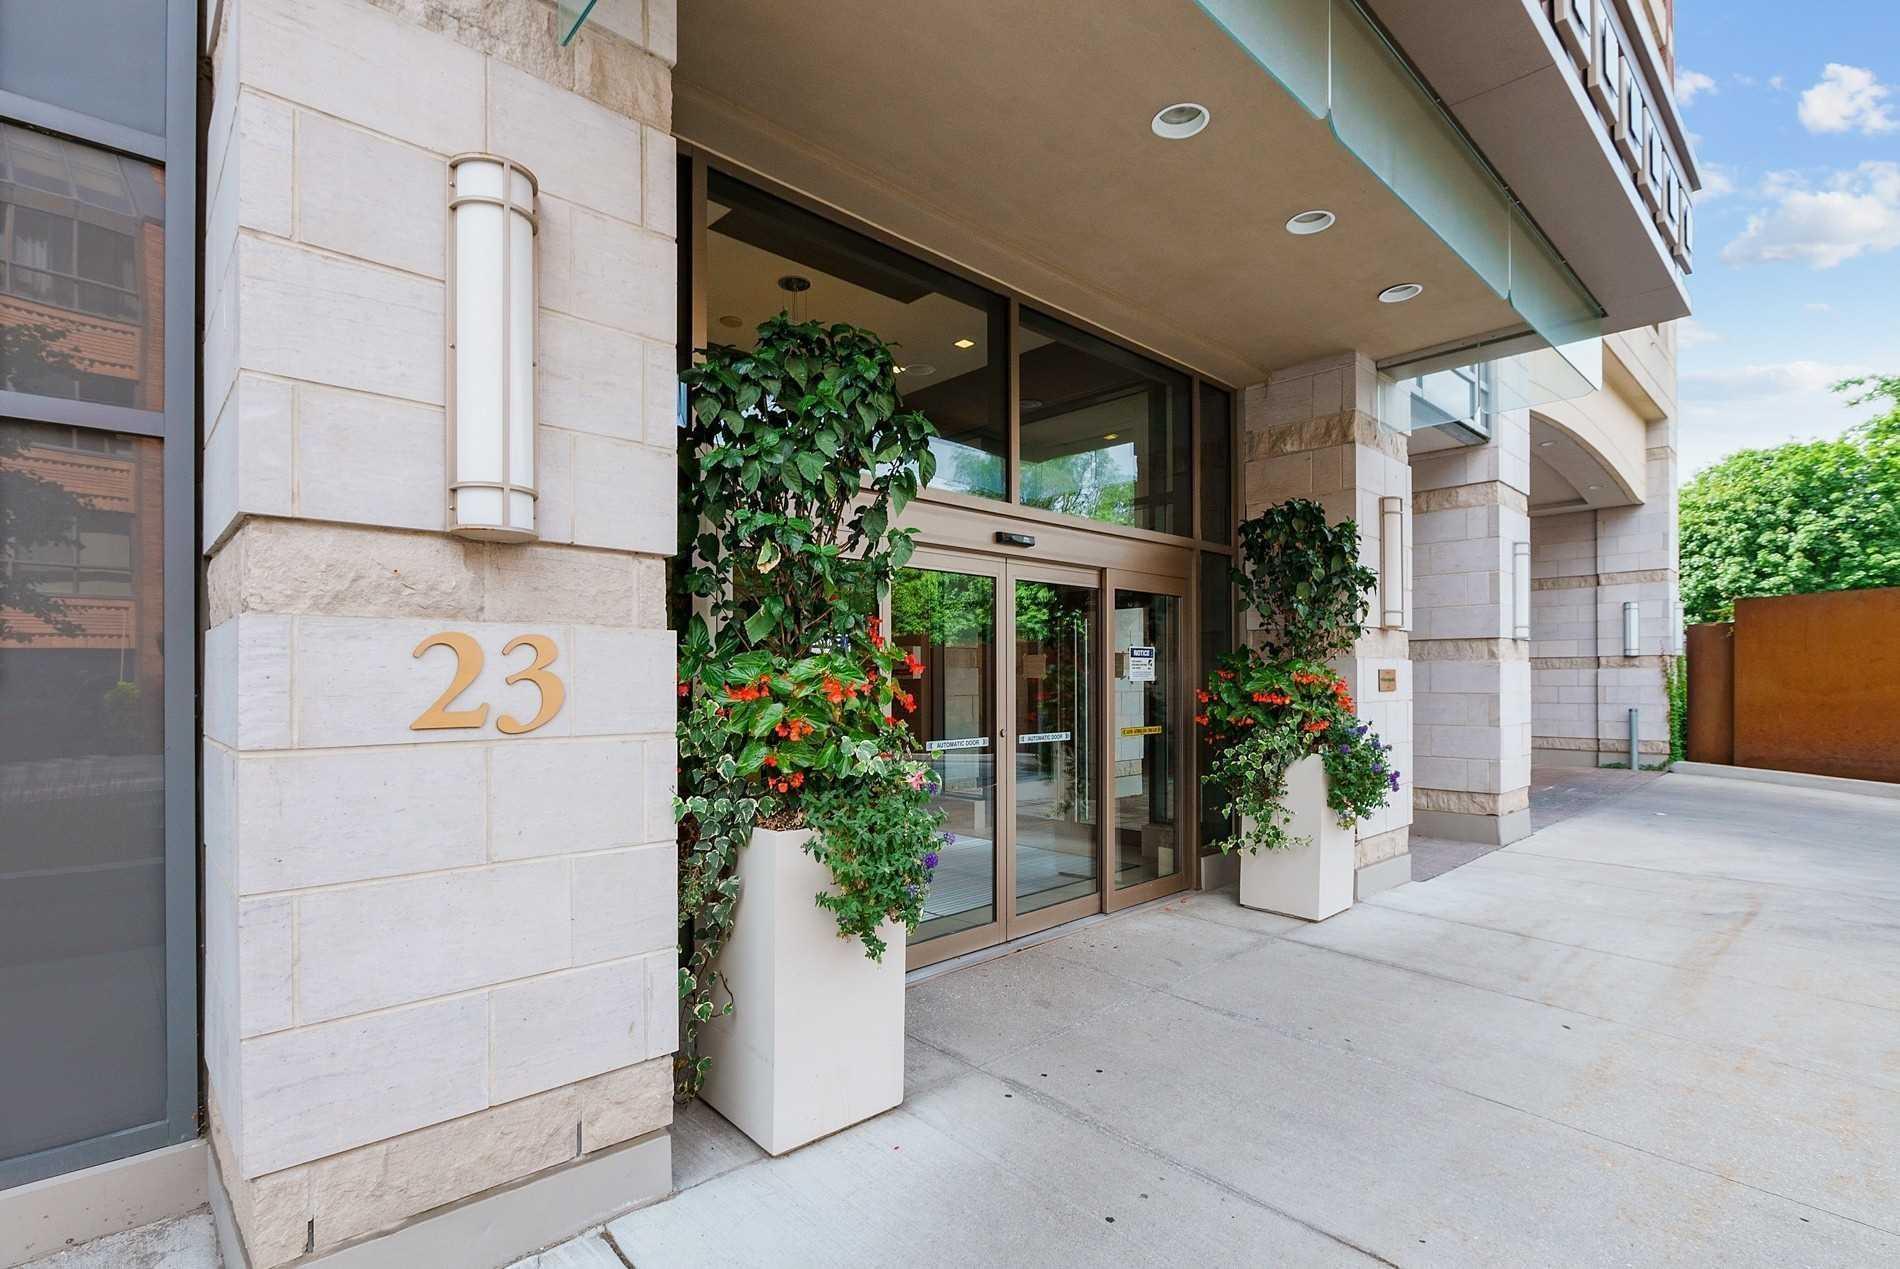 #325 - 23 Glebe Rd, Toronto